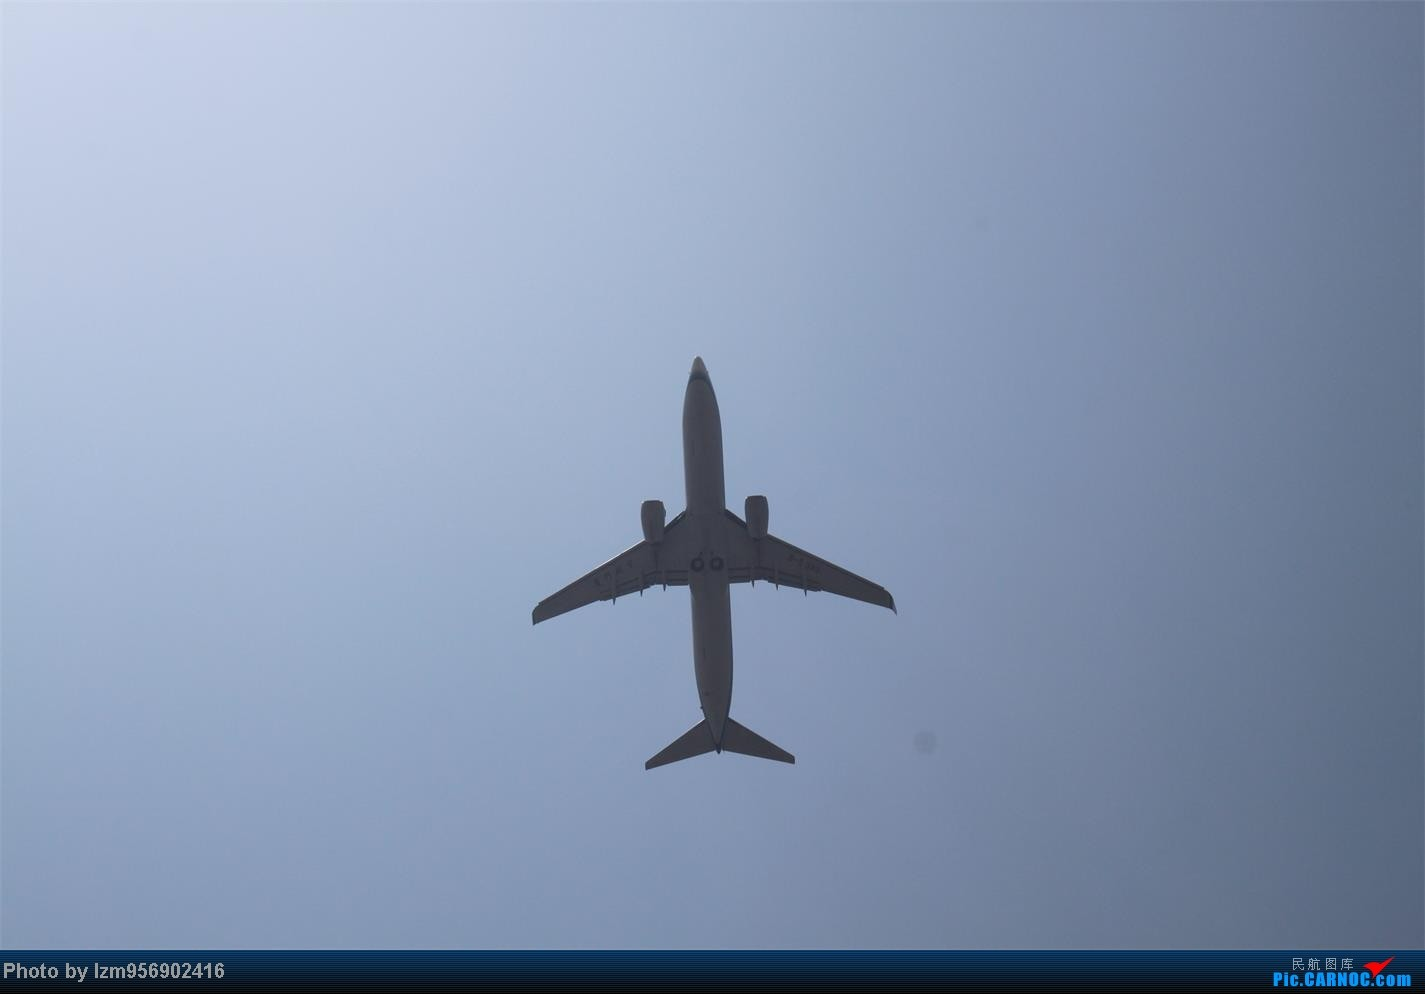 Re:[原创]DLC蹲点大半天,拍到了大棒航空772=w= BOEING 737-800 B-5389 中国大连周水子机场